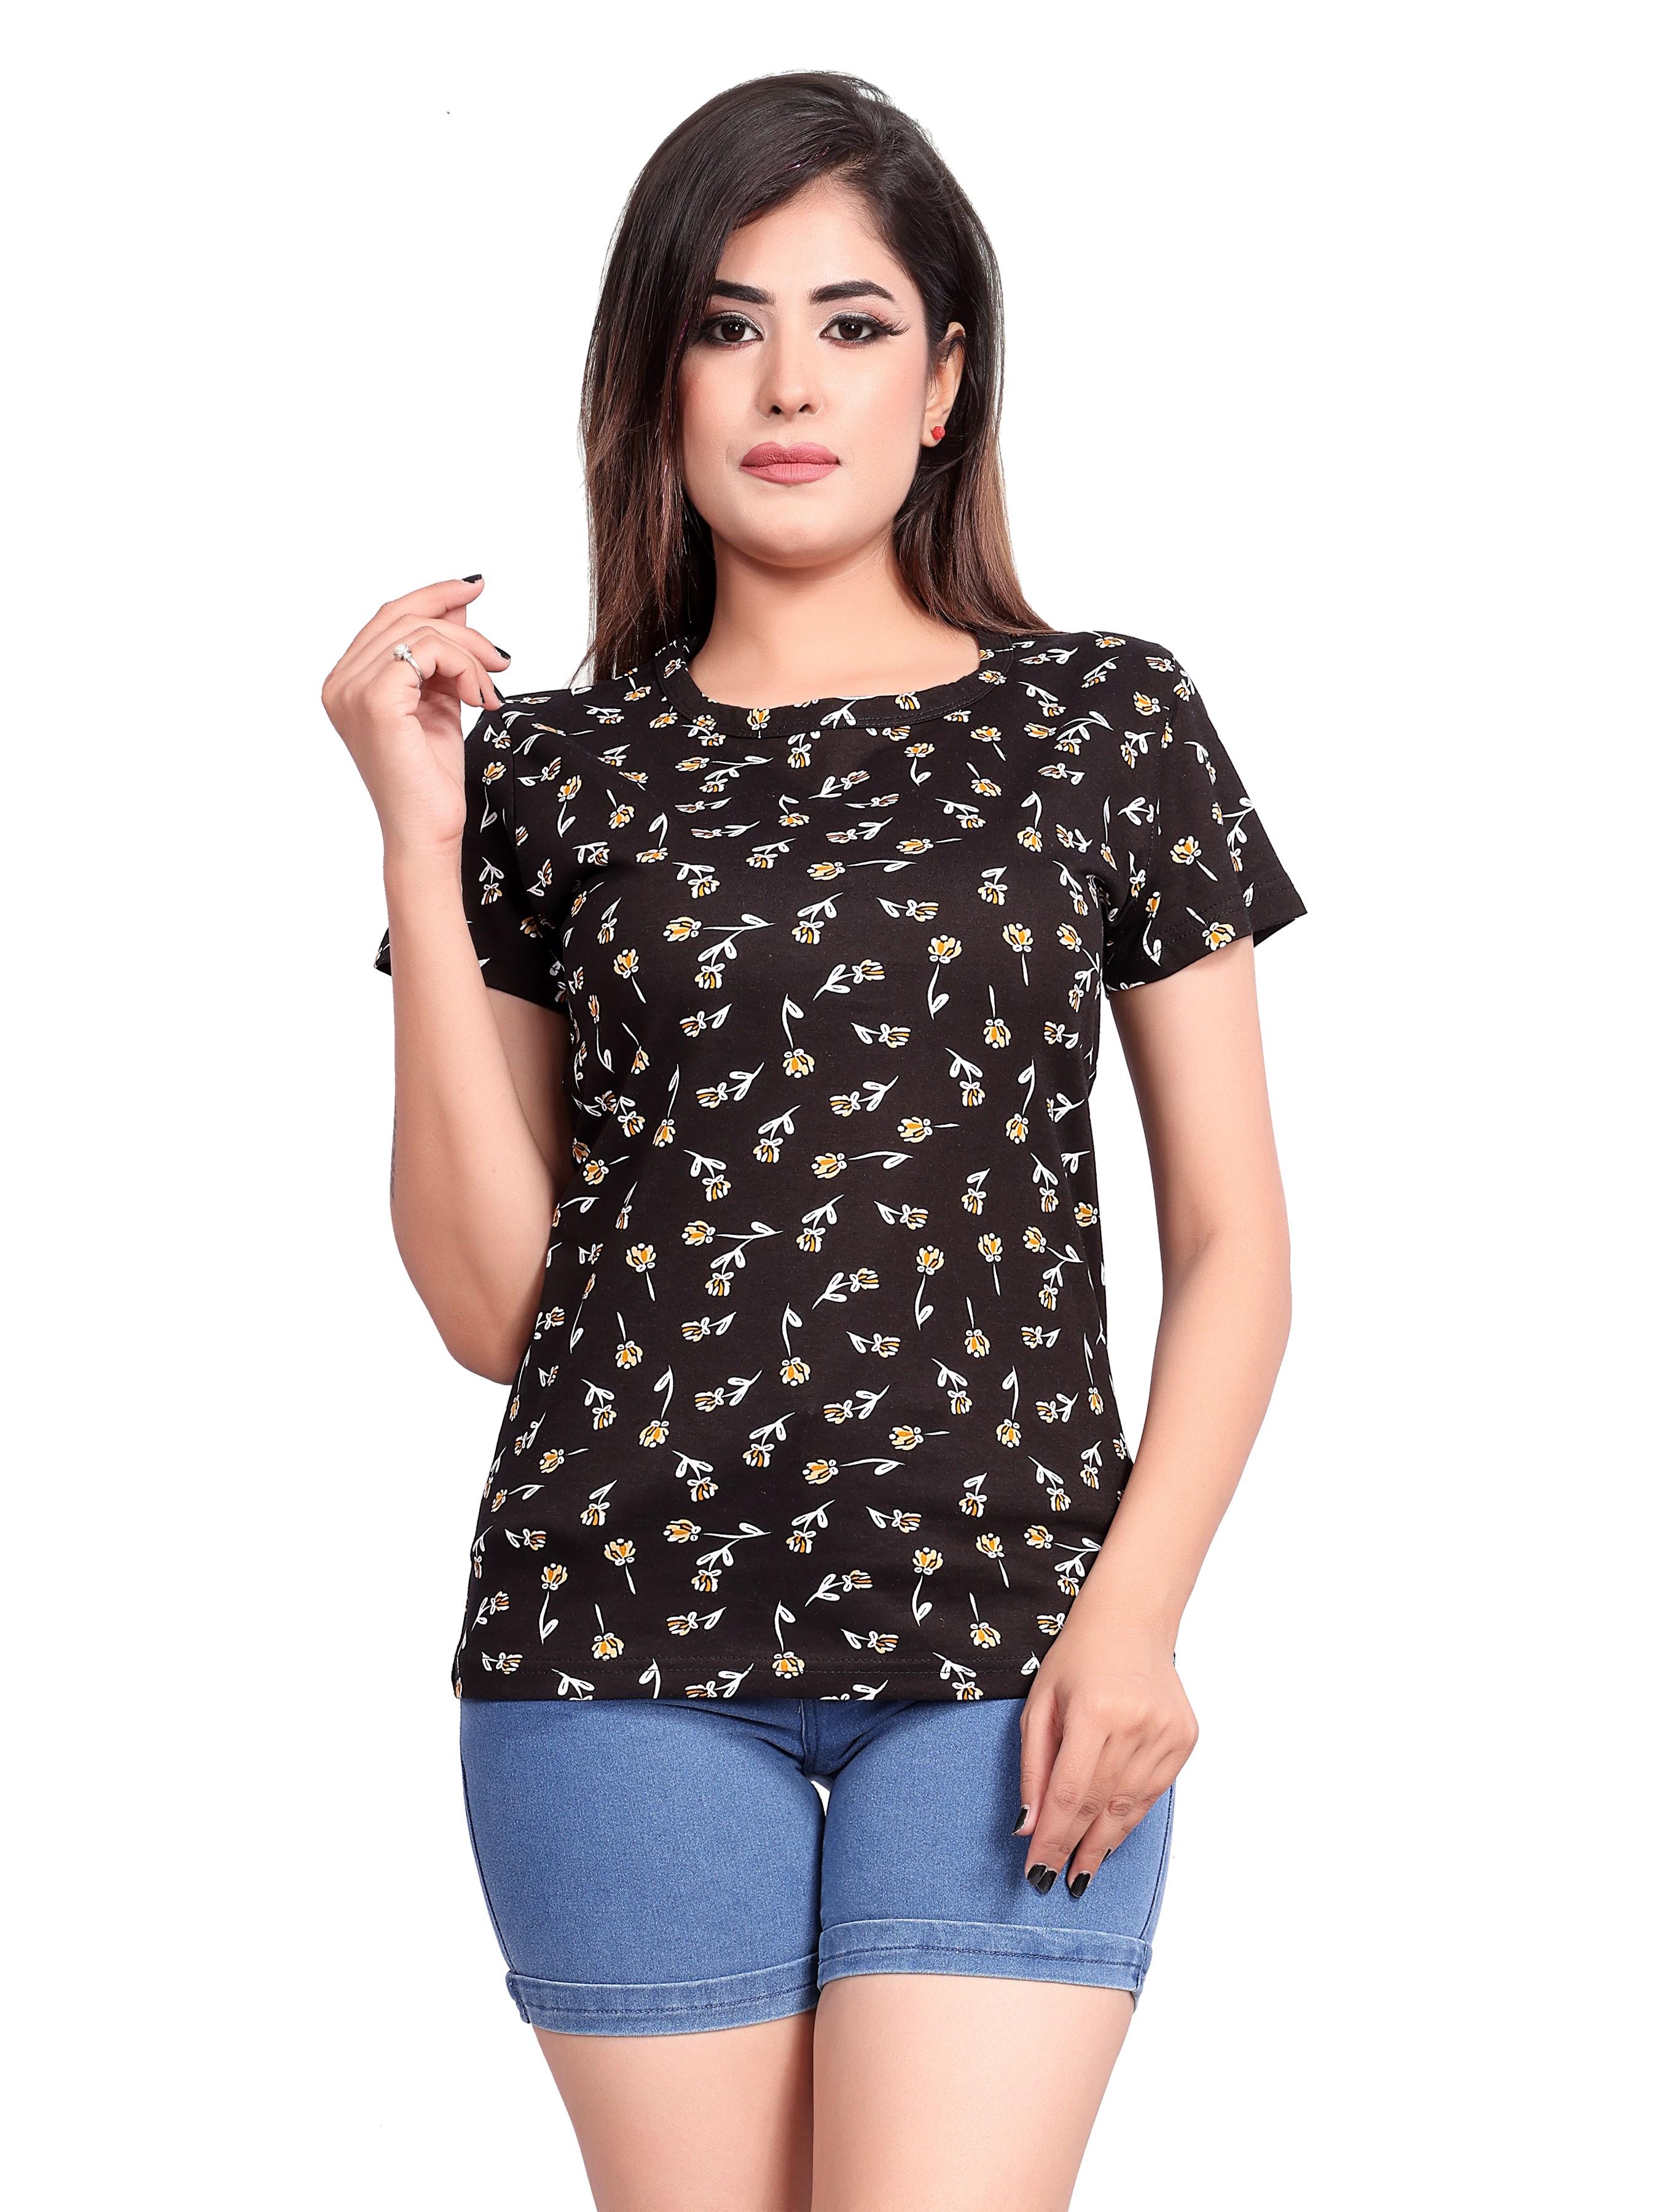 Impex | IMPEX Women's Black Cotton Hosiery Printed Round Neck T-shirt